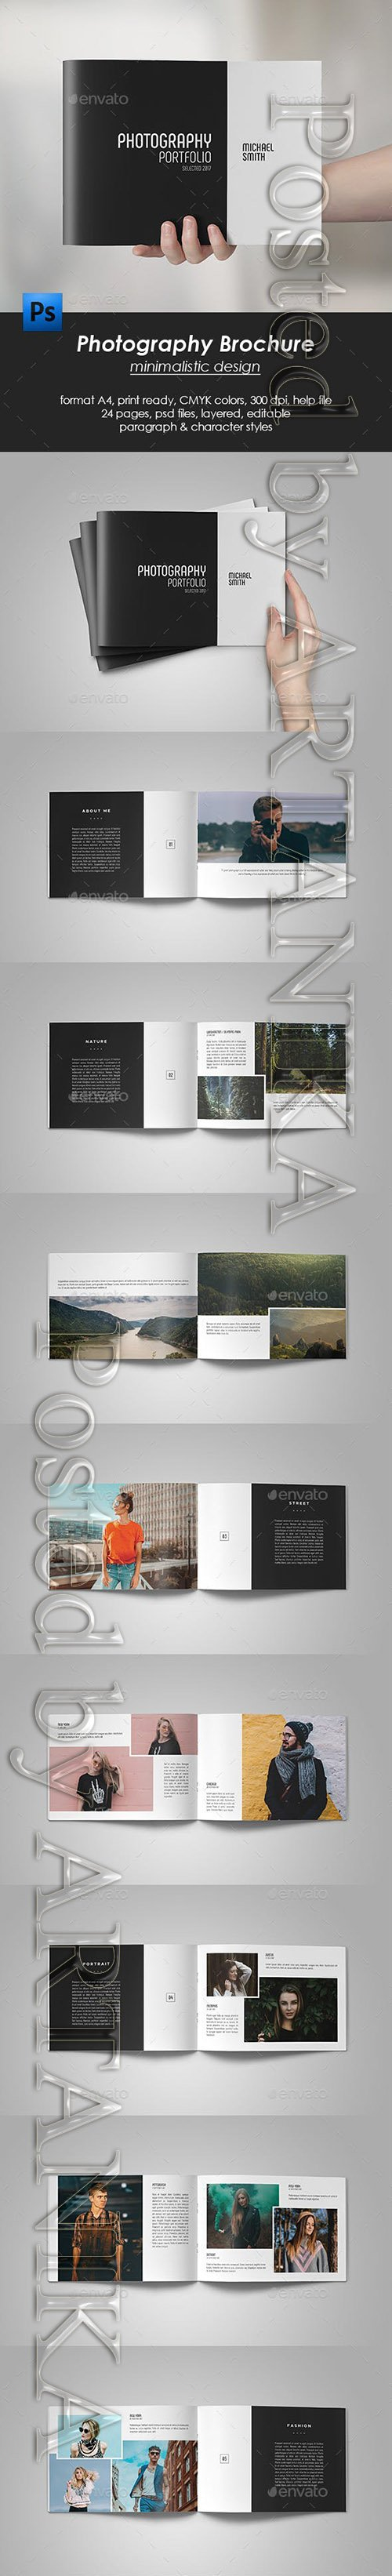 Photography Portfolio Brochure 21186831